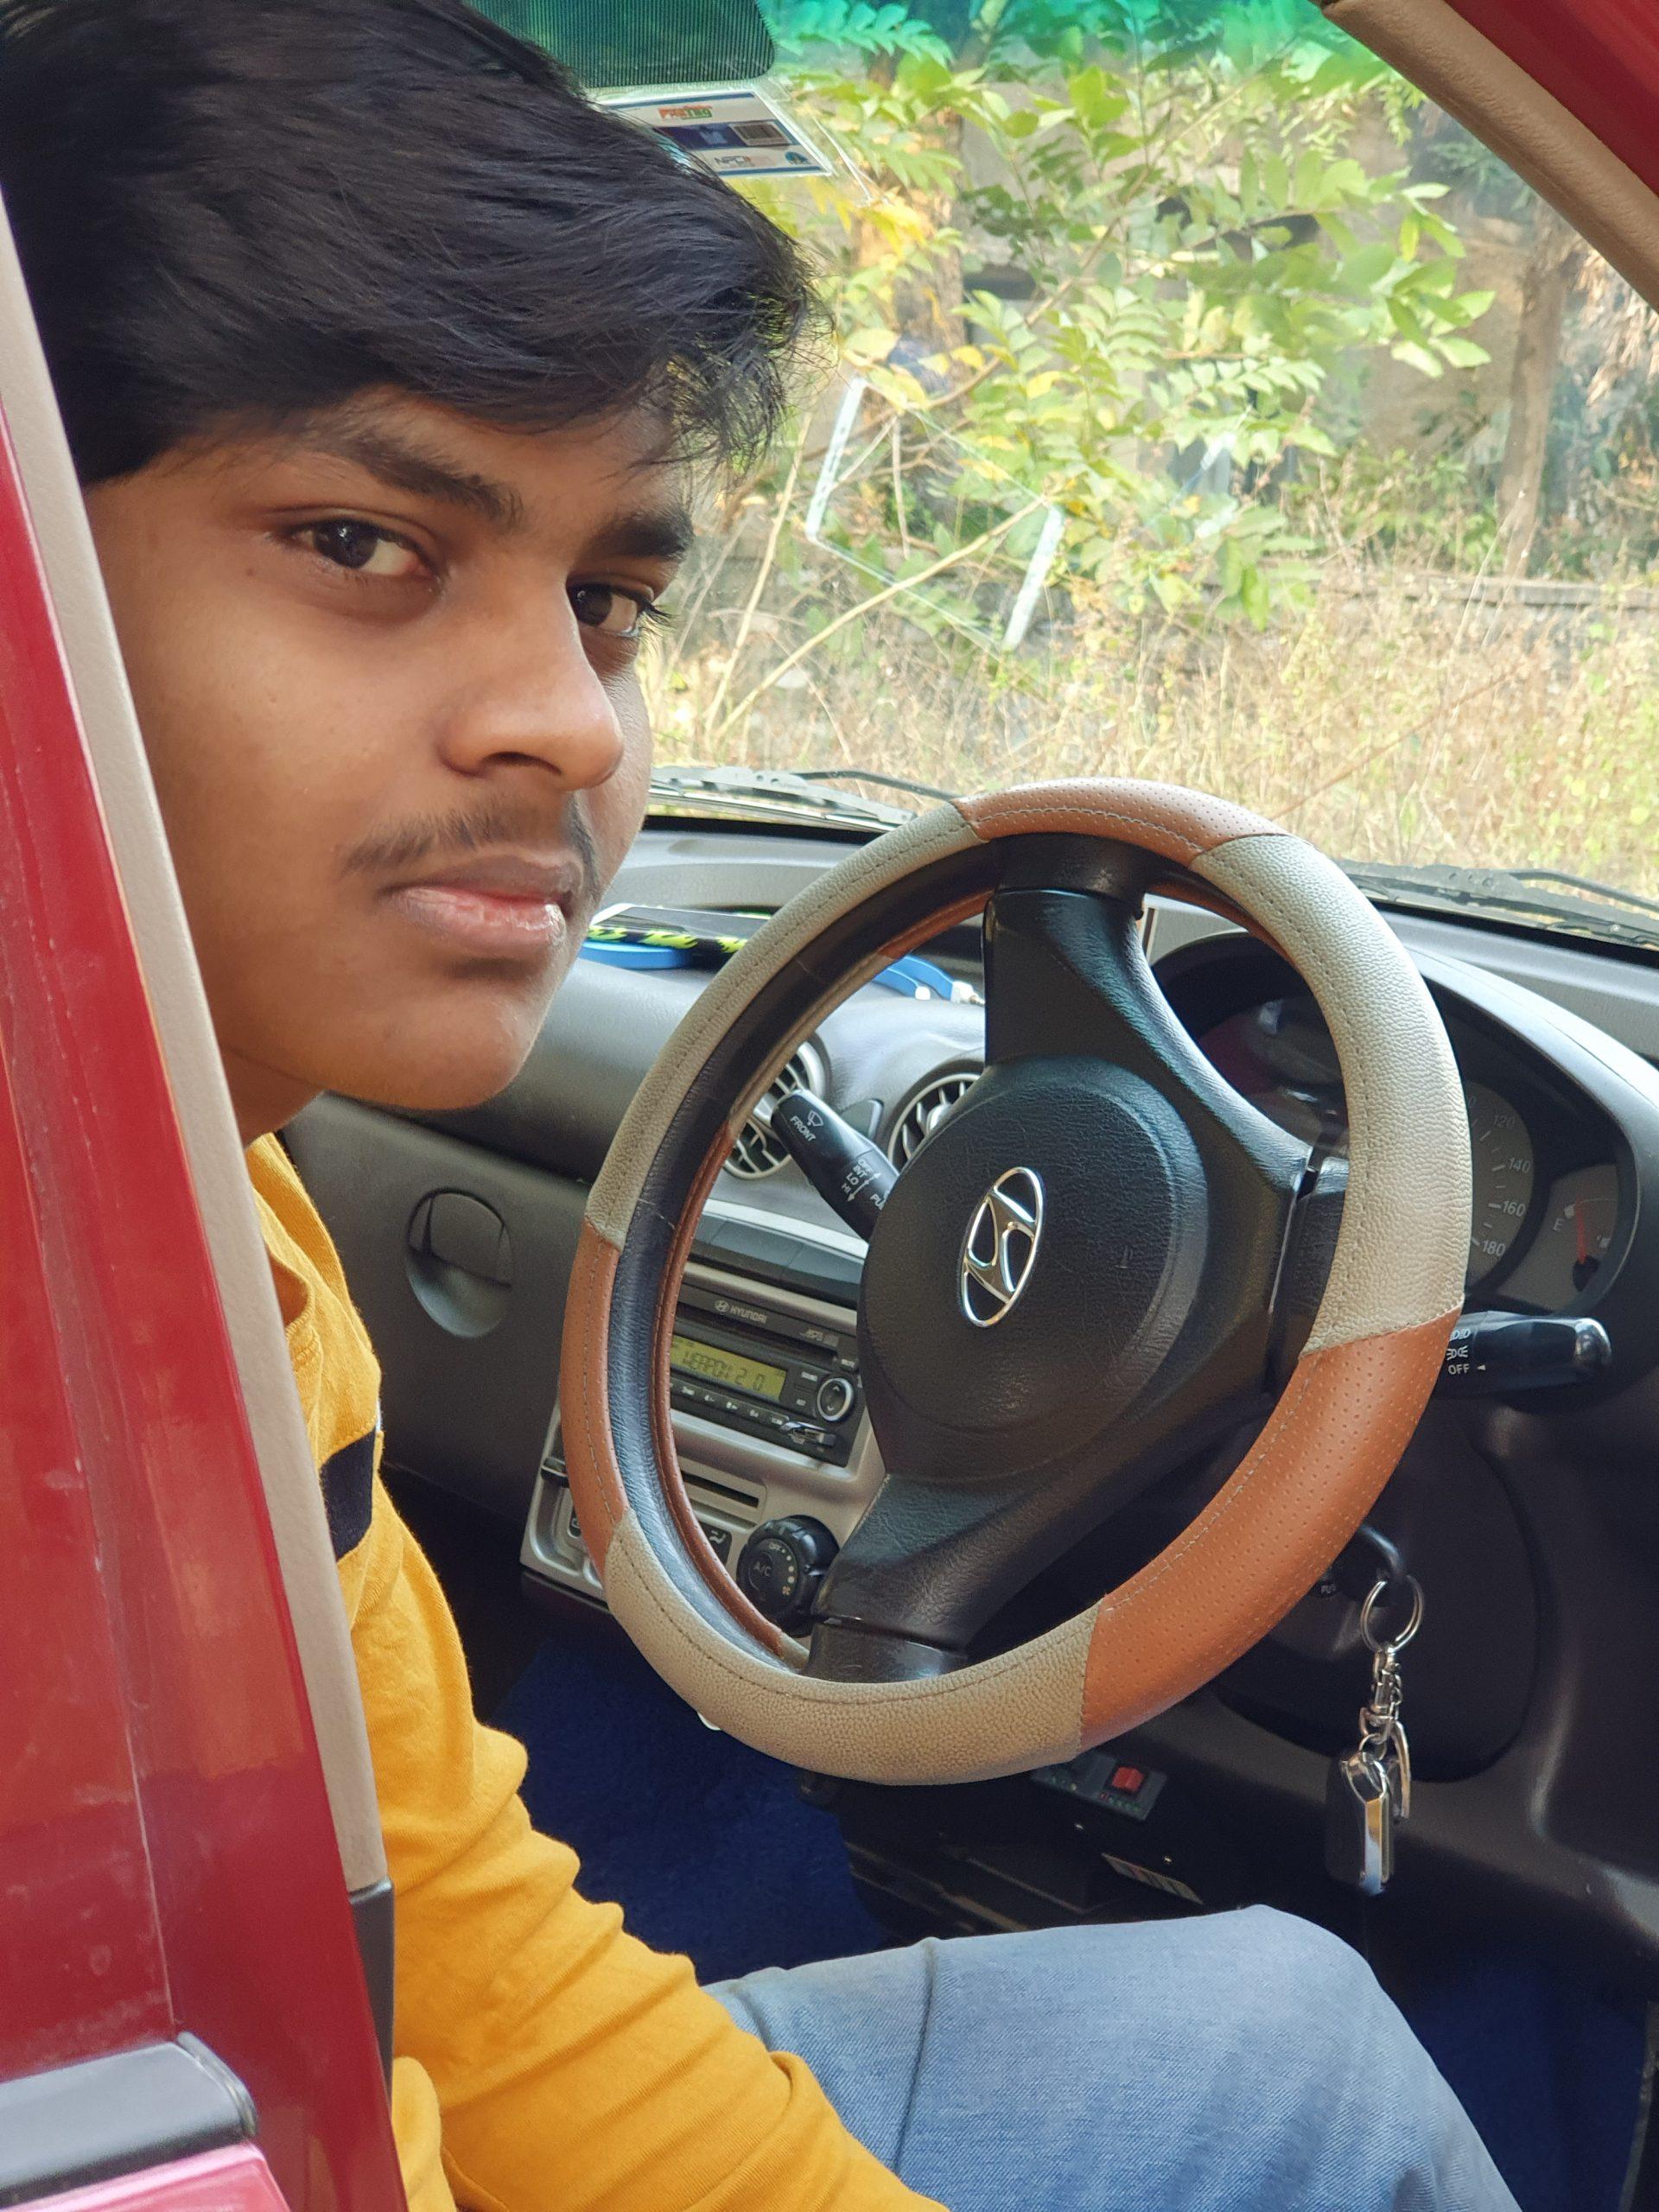 A boy in a car